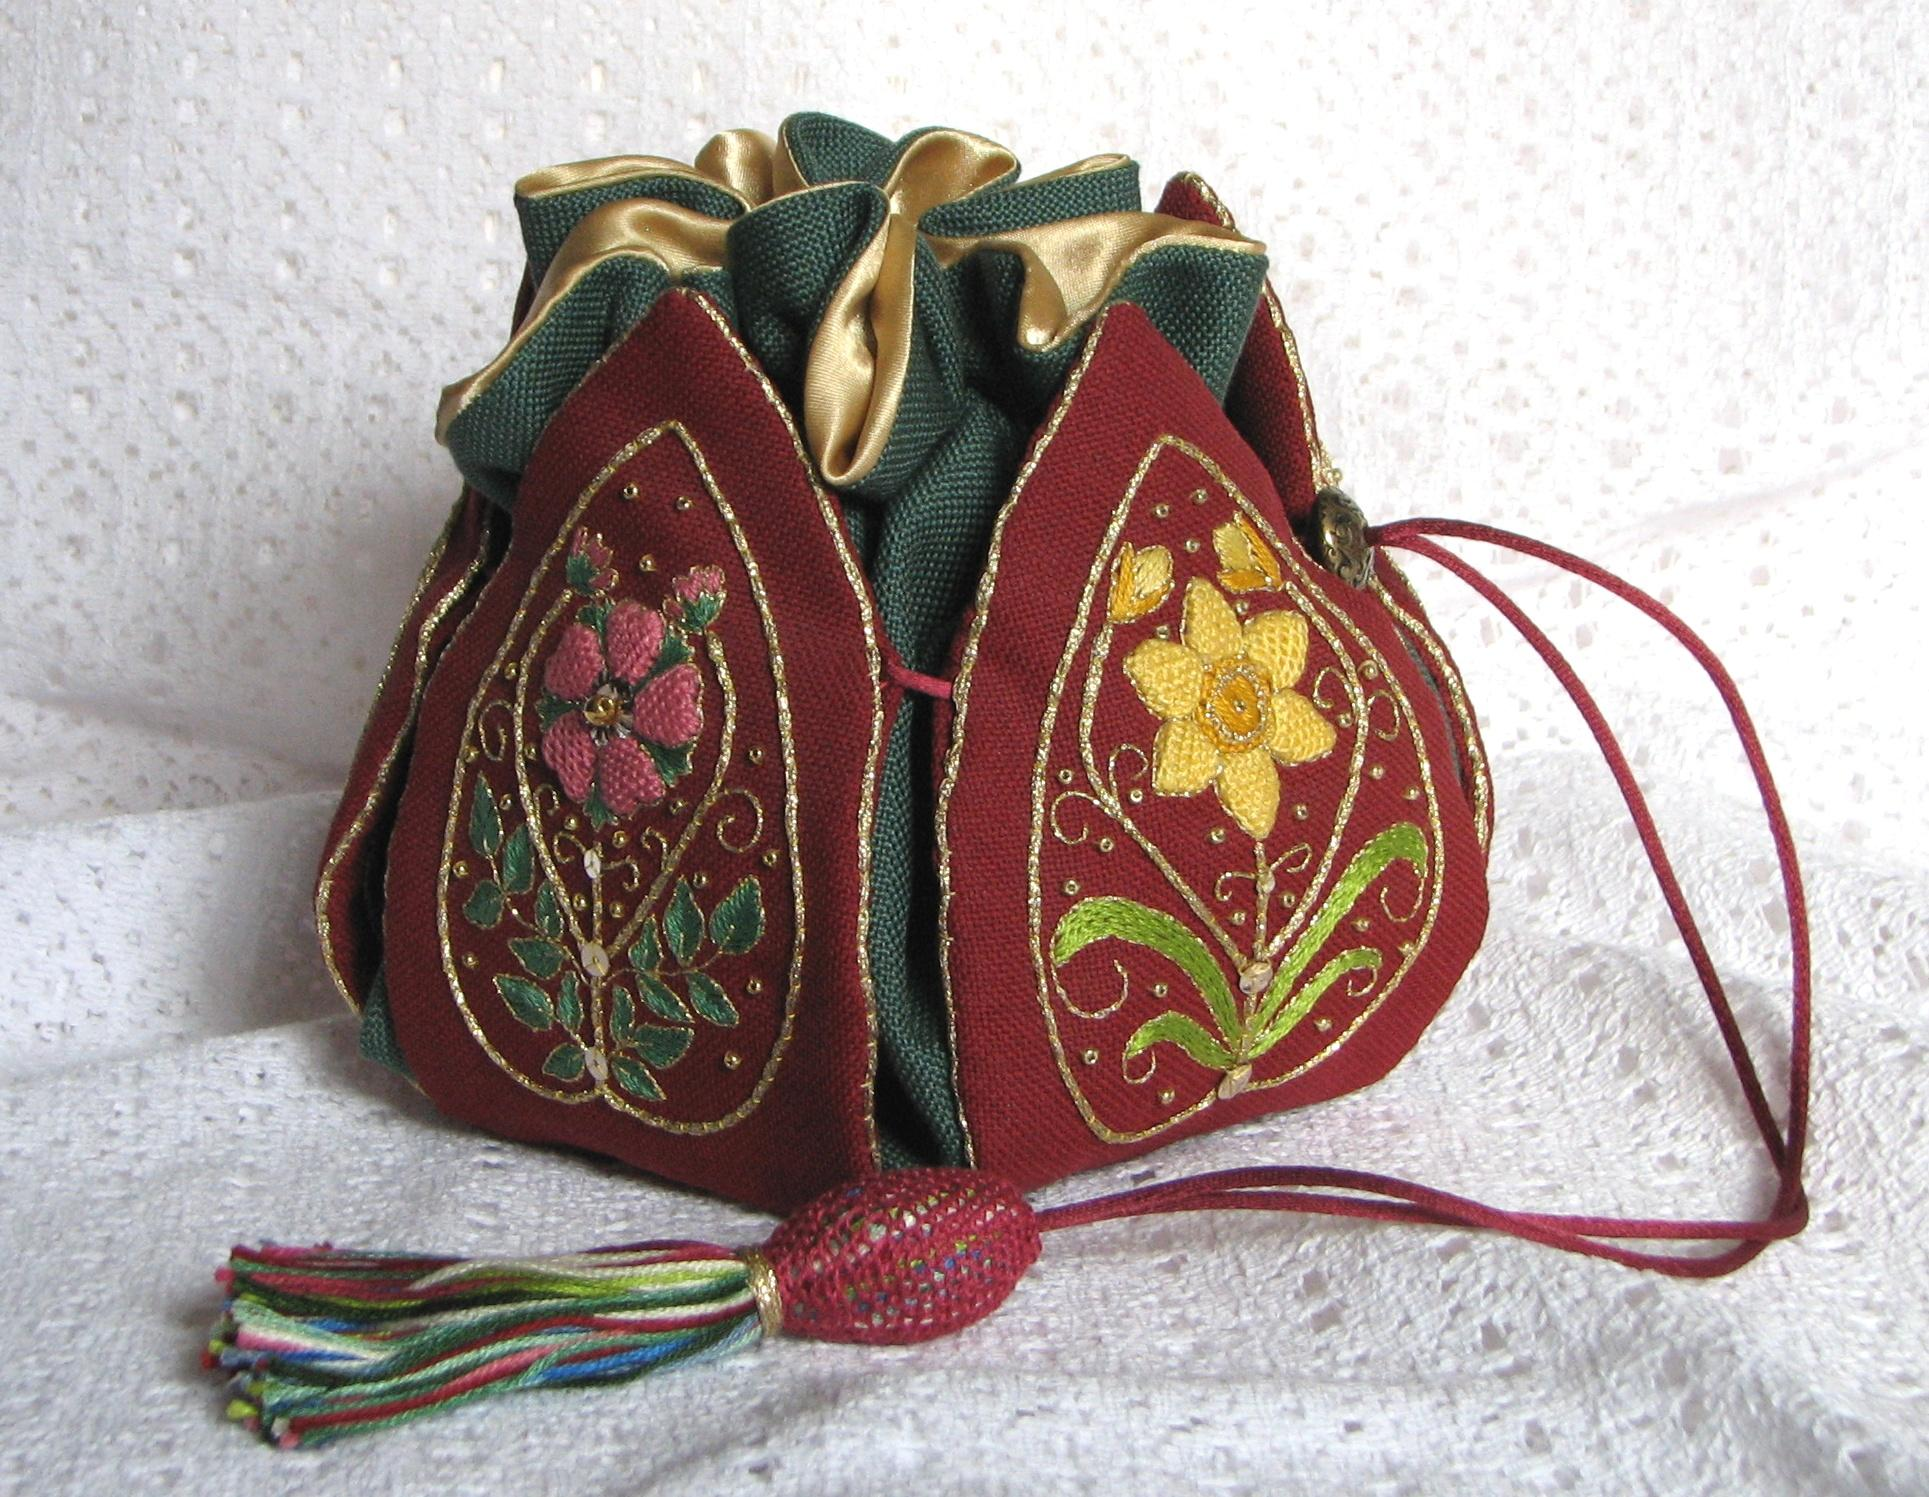 A stumpwork embroidery 'petal bag'